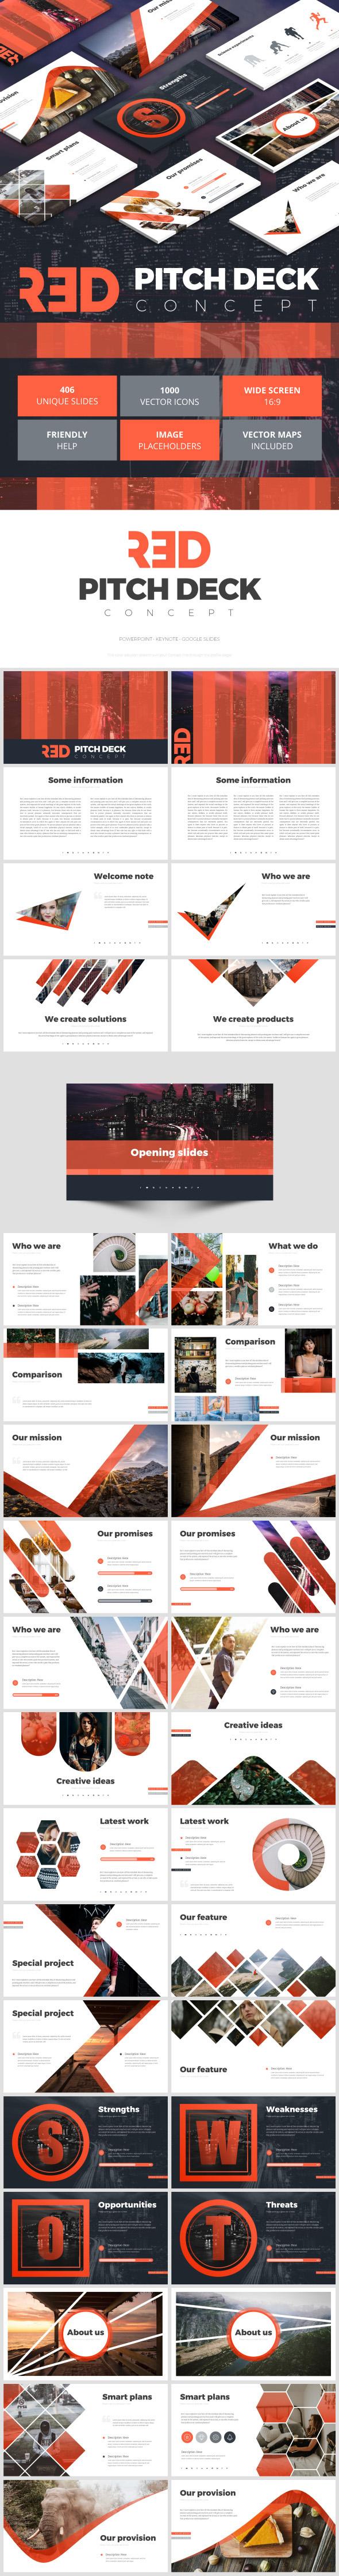 Pitch Deck Concept - Google Slides Presentation Templates